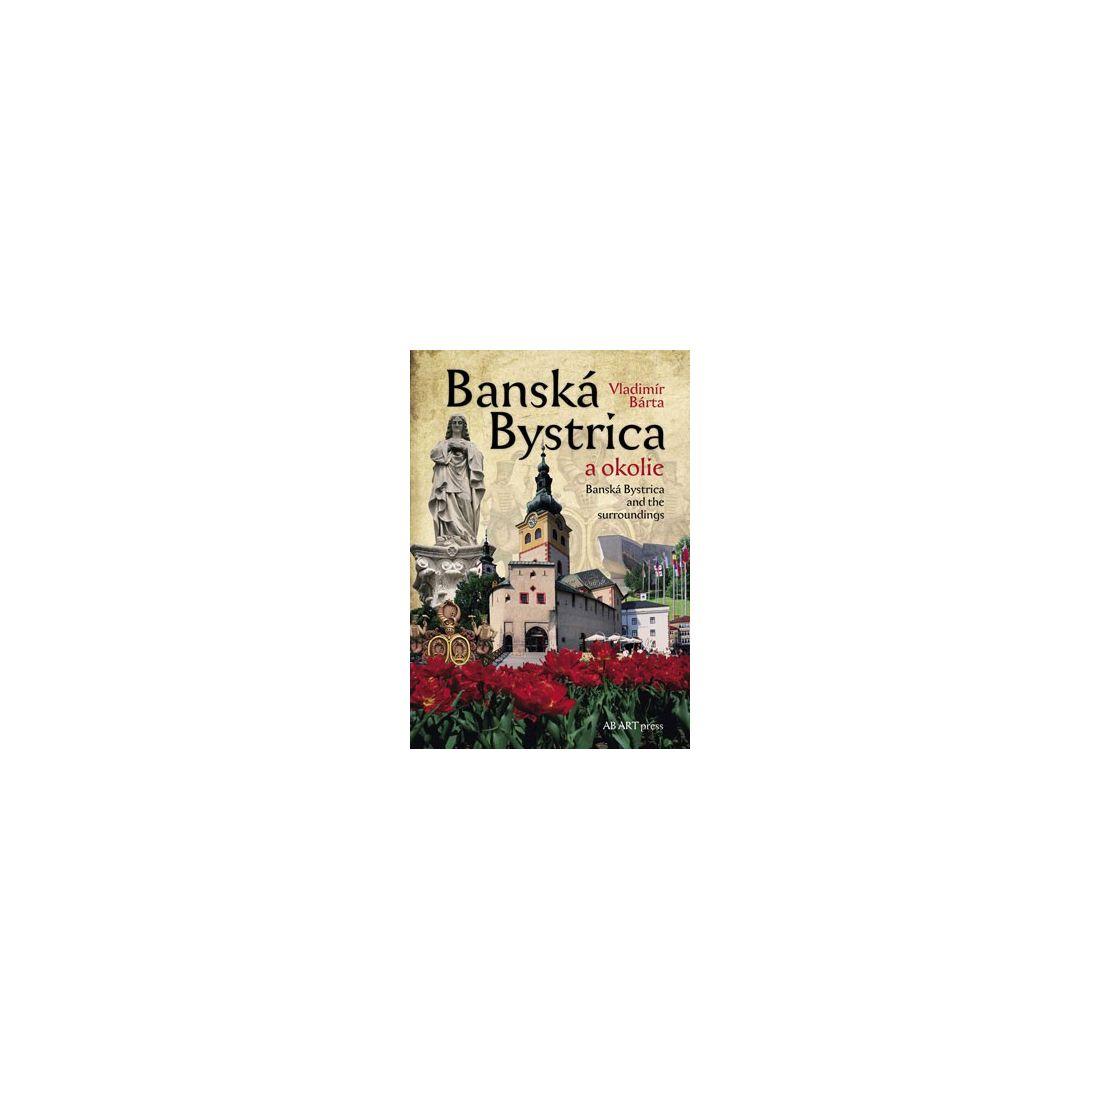 f0796cec2 book4you - Mestá a regióny - Banská Bystrica a okolie